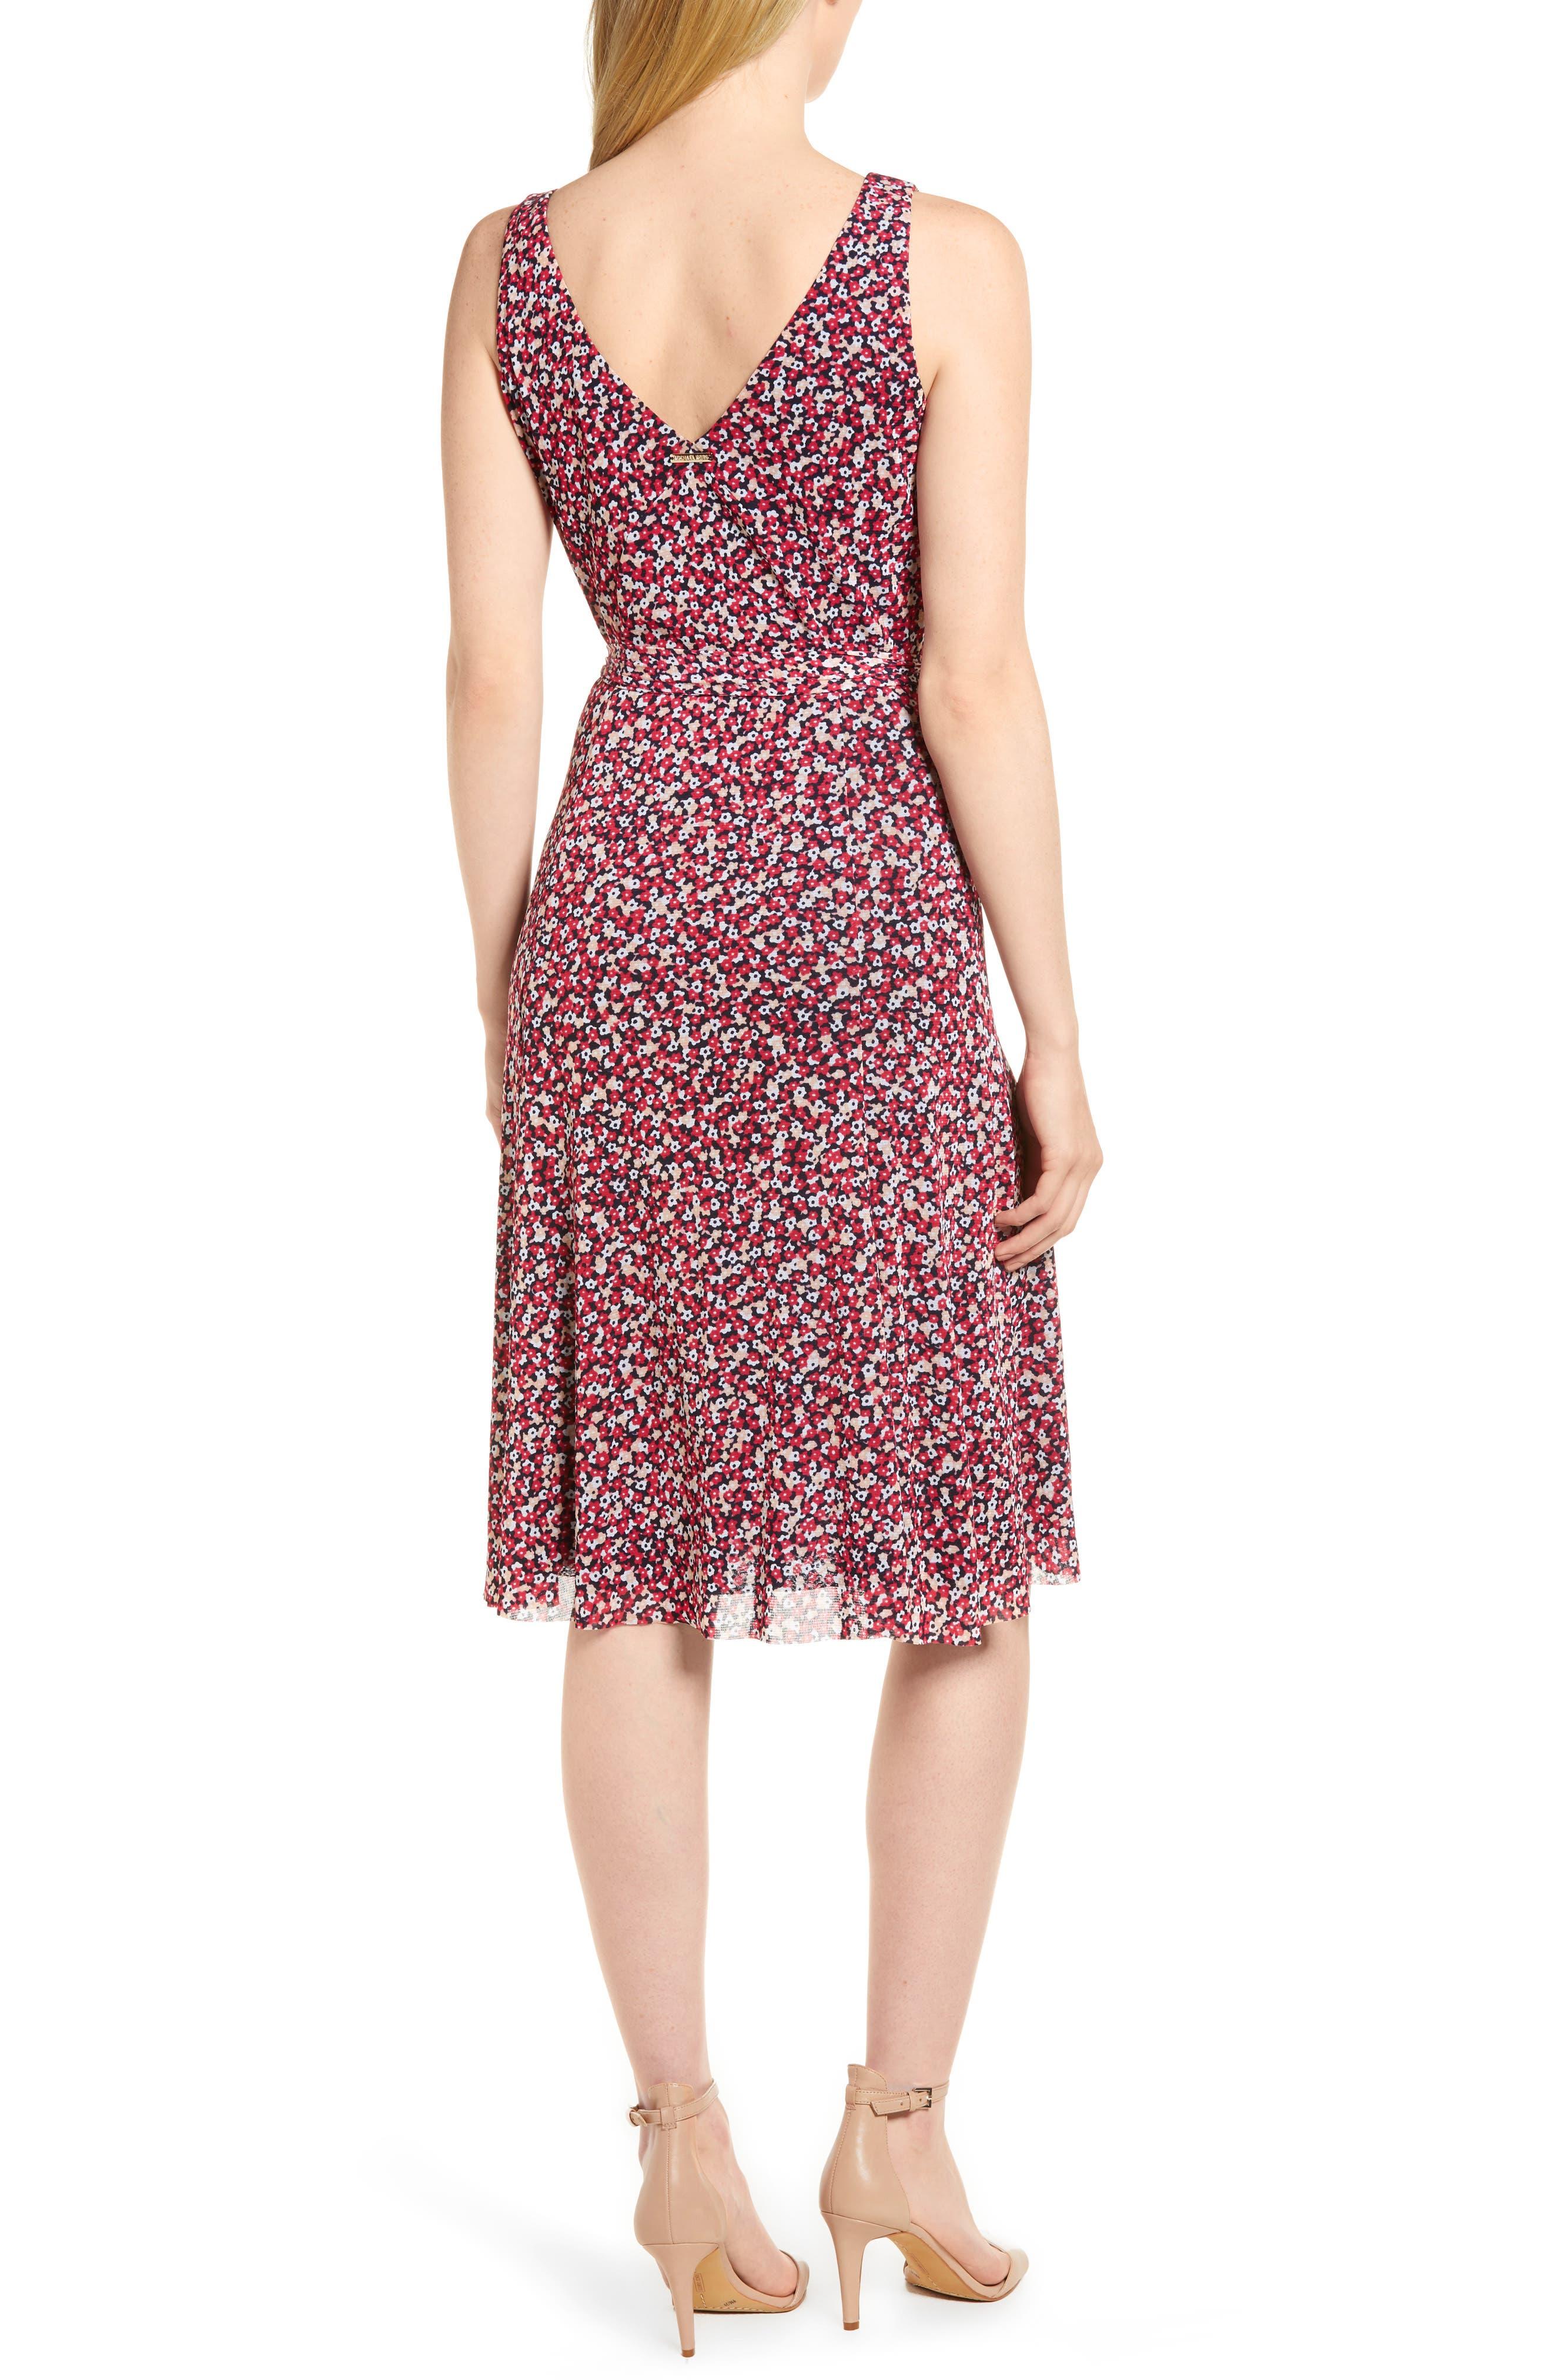 Floral Tank Dress,                             Alternate thumbnail 2, color,                             True Navy/ Bright Blush